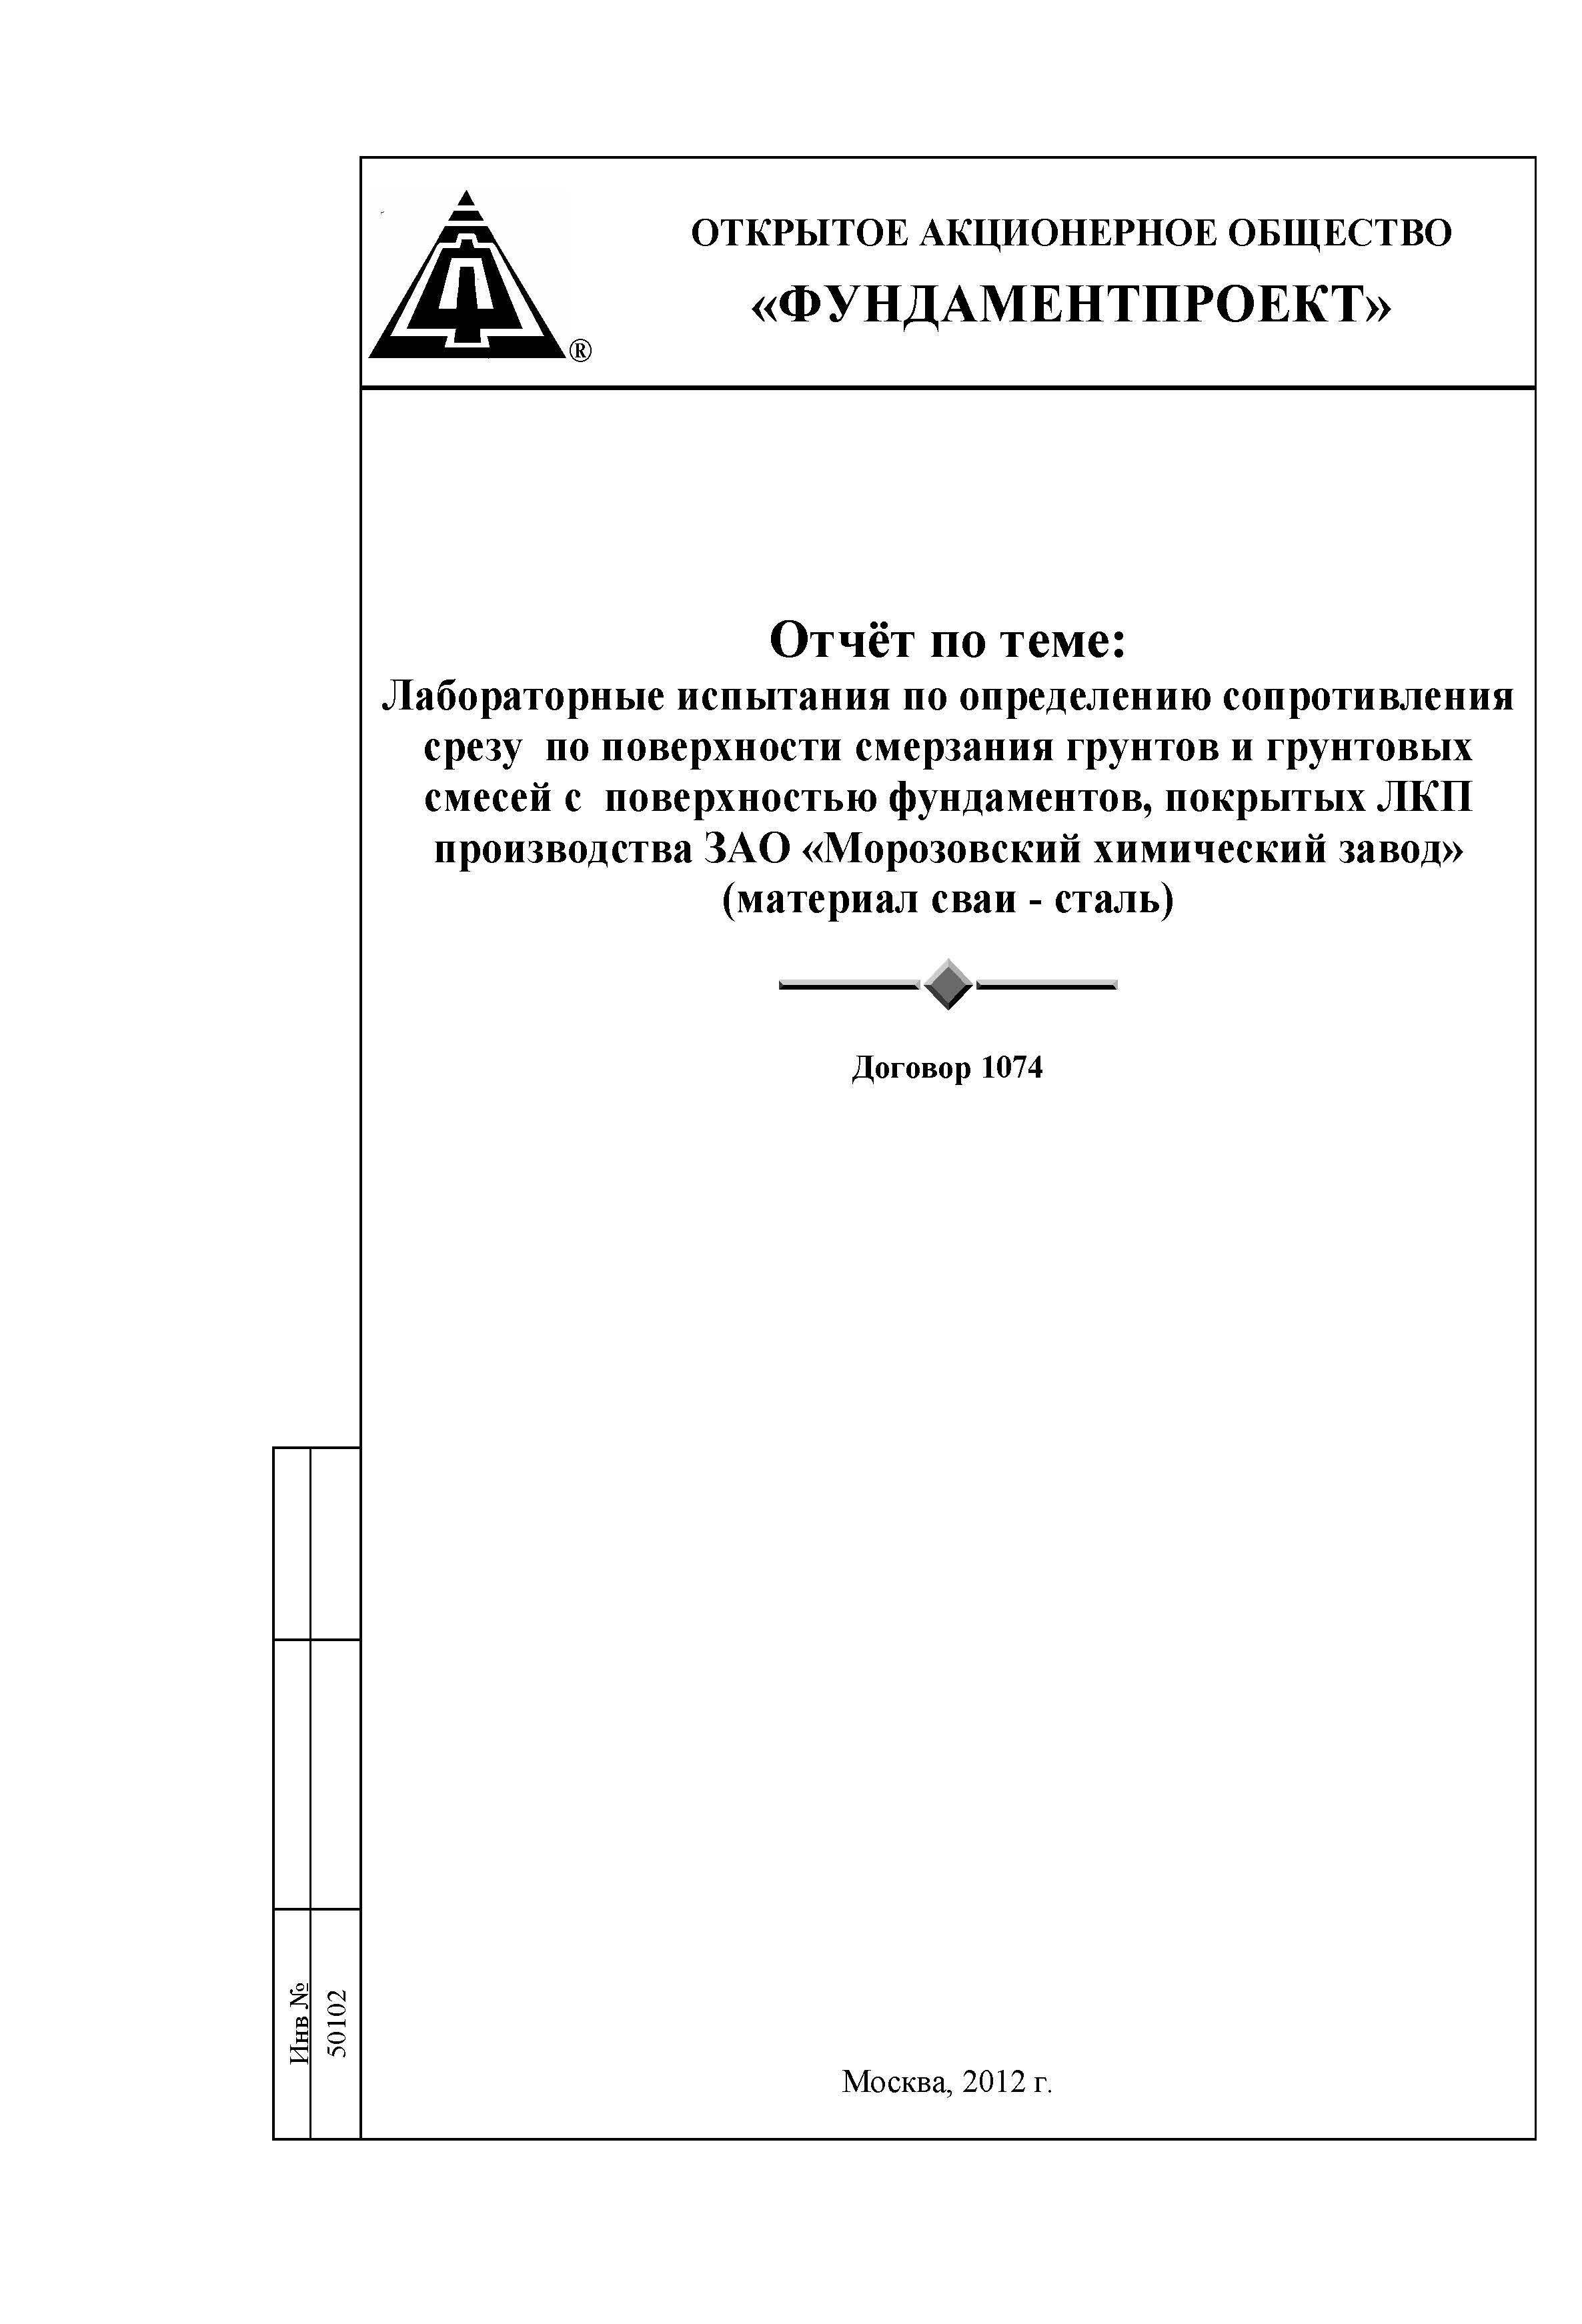 Отчет по сваям Армокот V500 Фундаментпроект_Страница_01